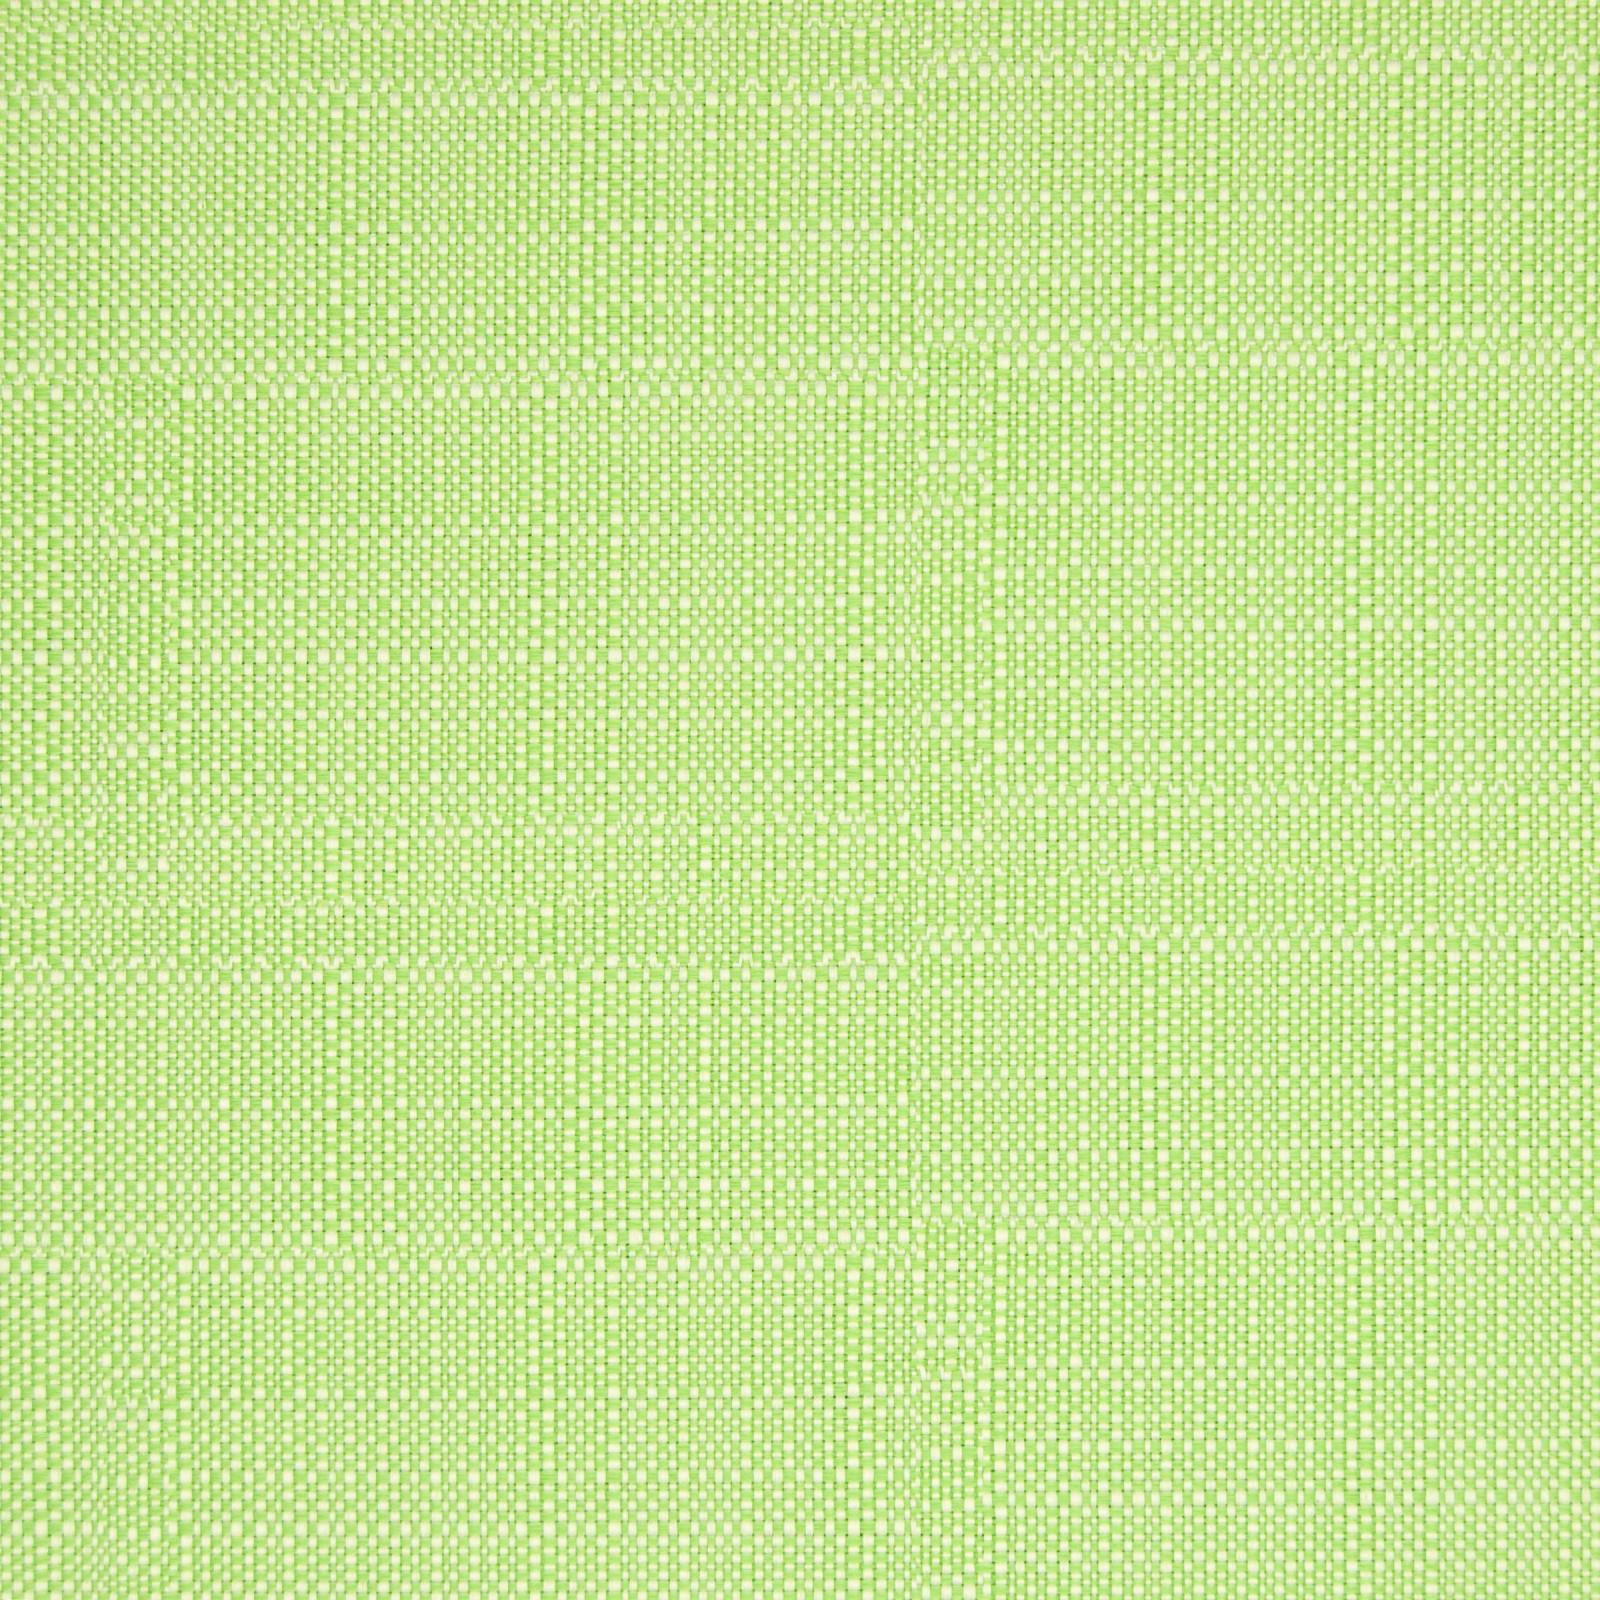 B6880 Island Green Greenhouse Fabrics